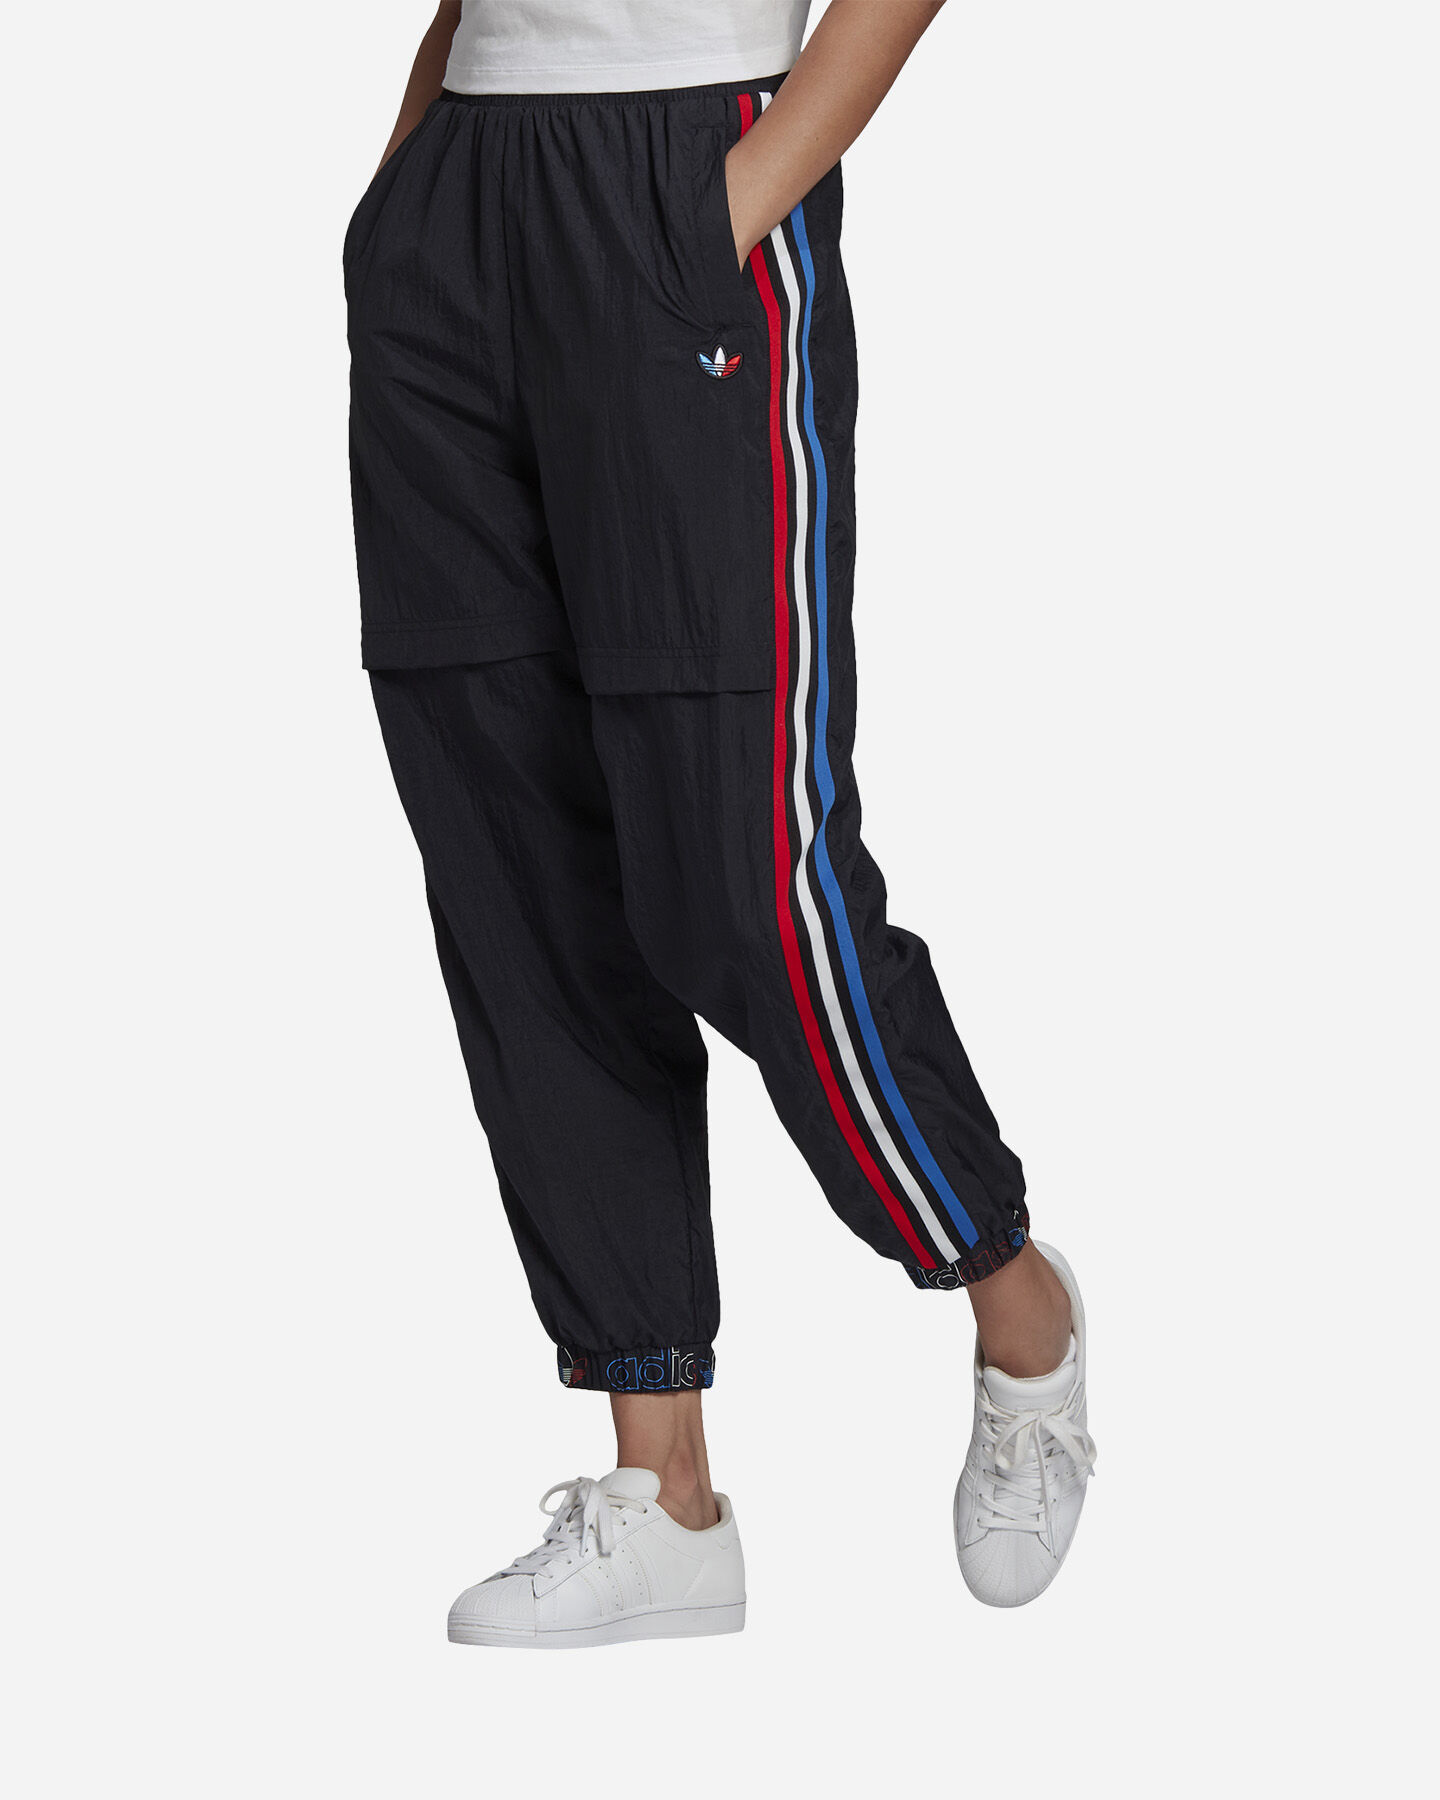 Pantalone ADIDAS ADICOLOR TRICOLOR JAPONA W S5272950 scatto 1